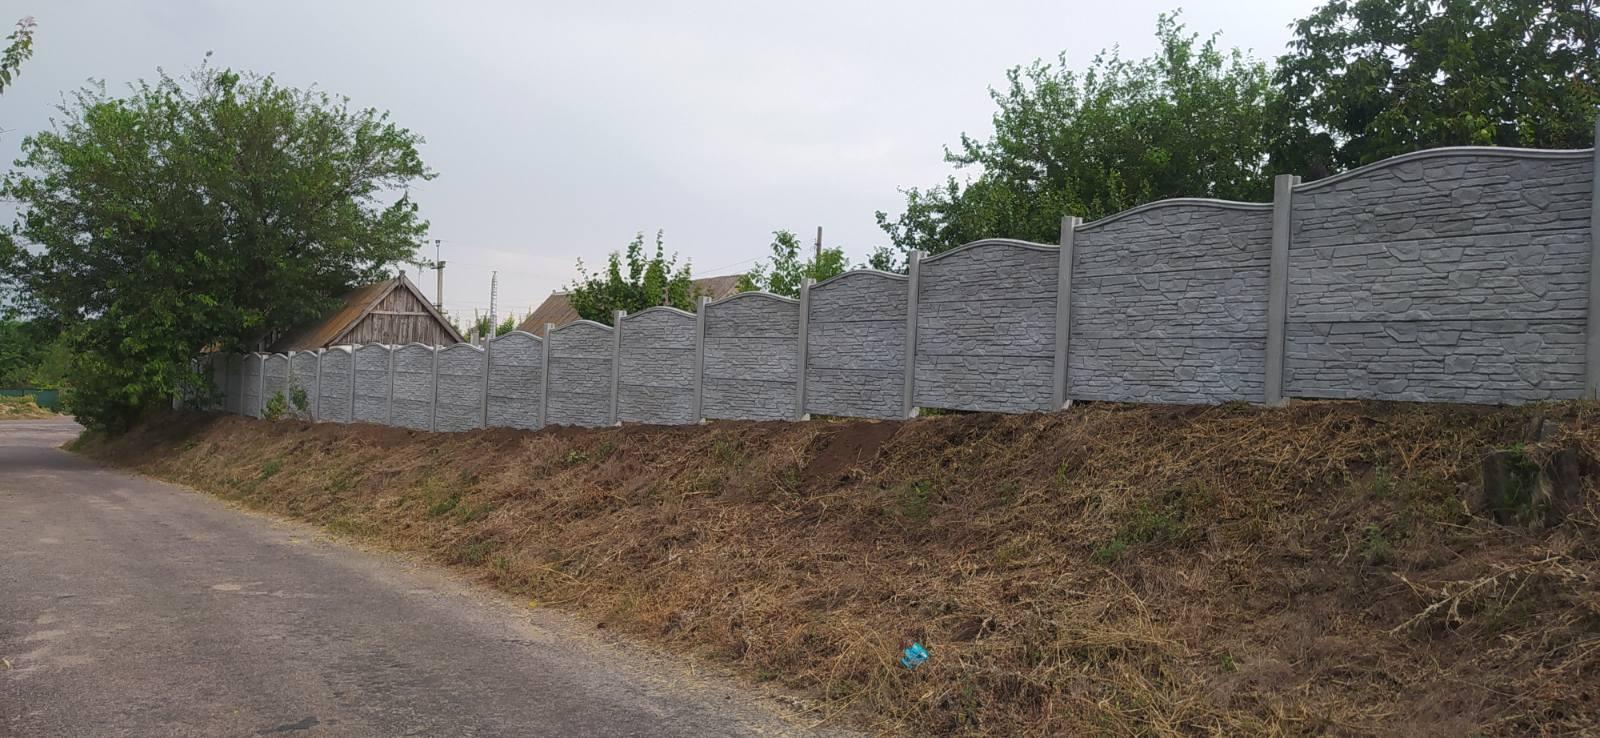 Установка бетонного забора с Верхня криниця (Попова) ул.Калинова 20